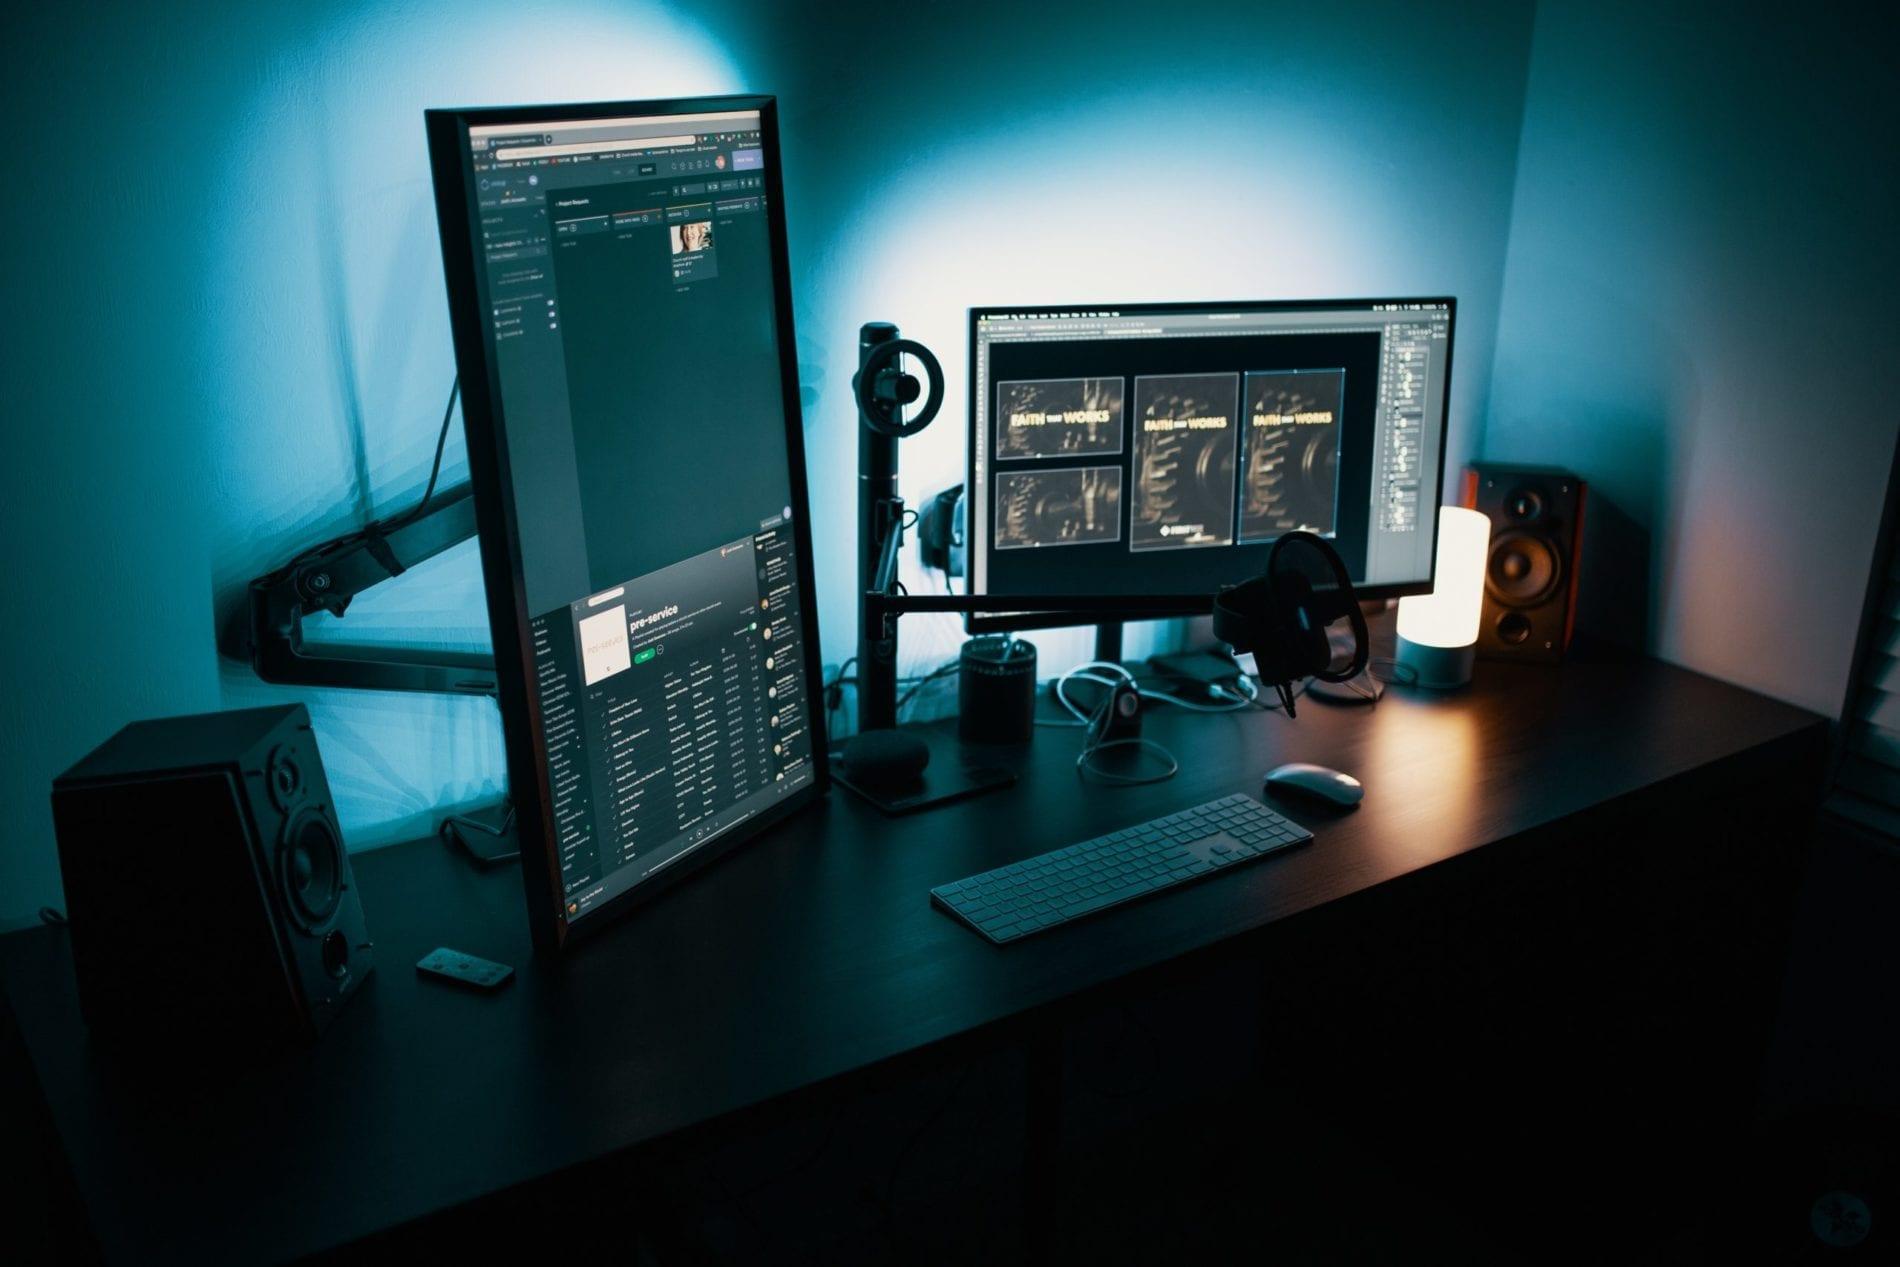 komputer-monitor-technologia